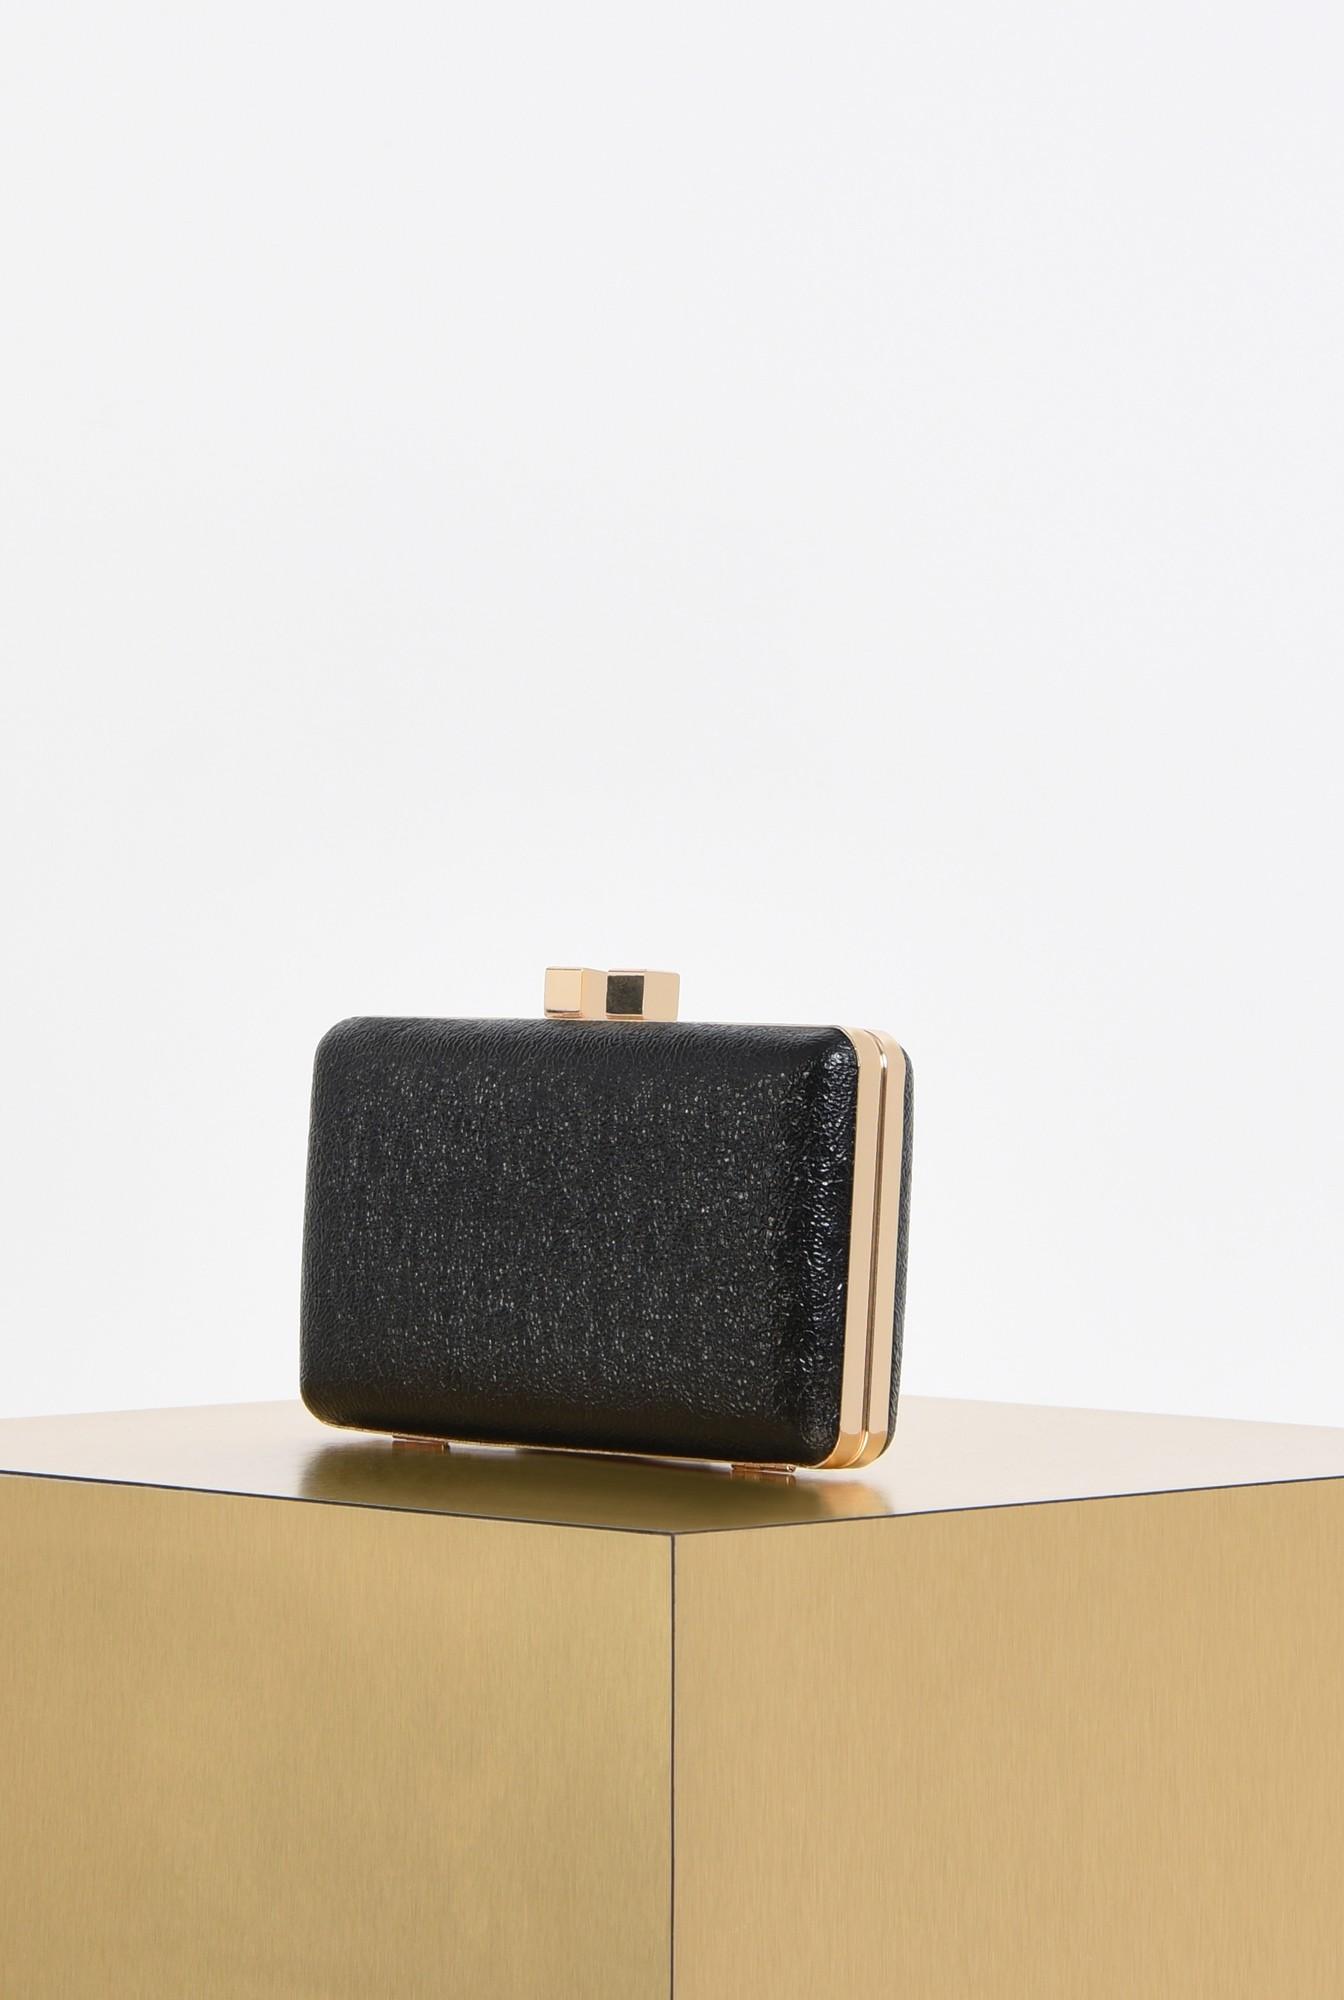 1 - plic elegant, negru, mini, grofrat, lant auriu